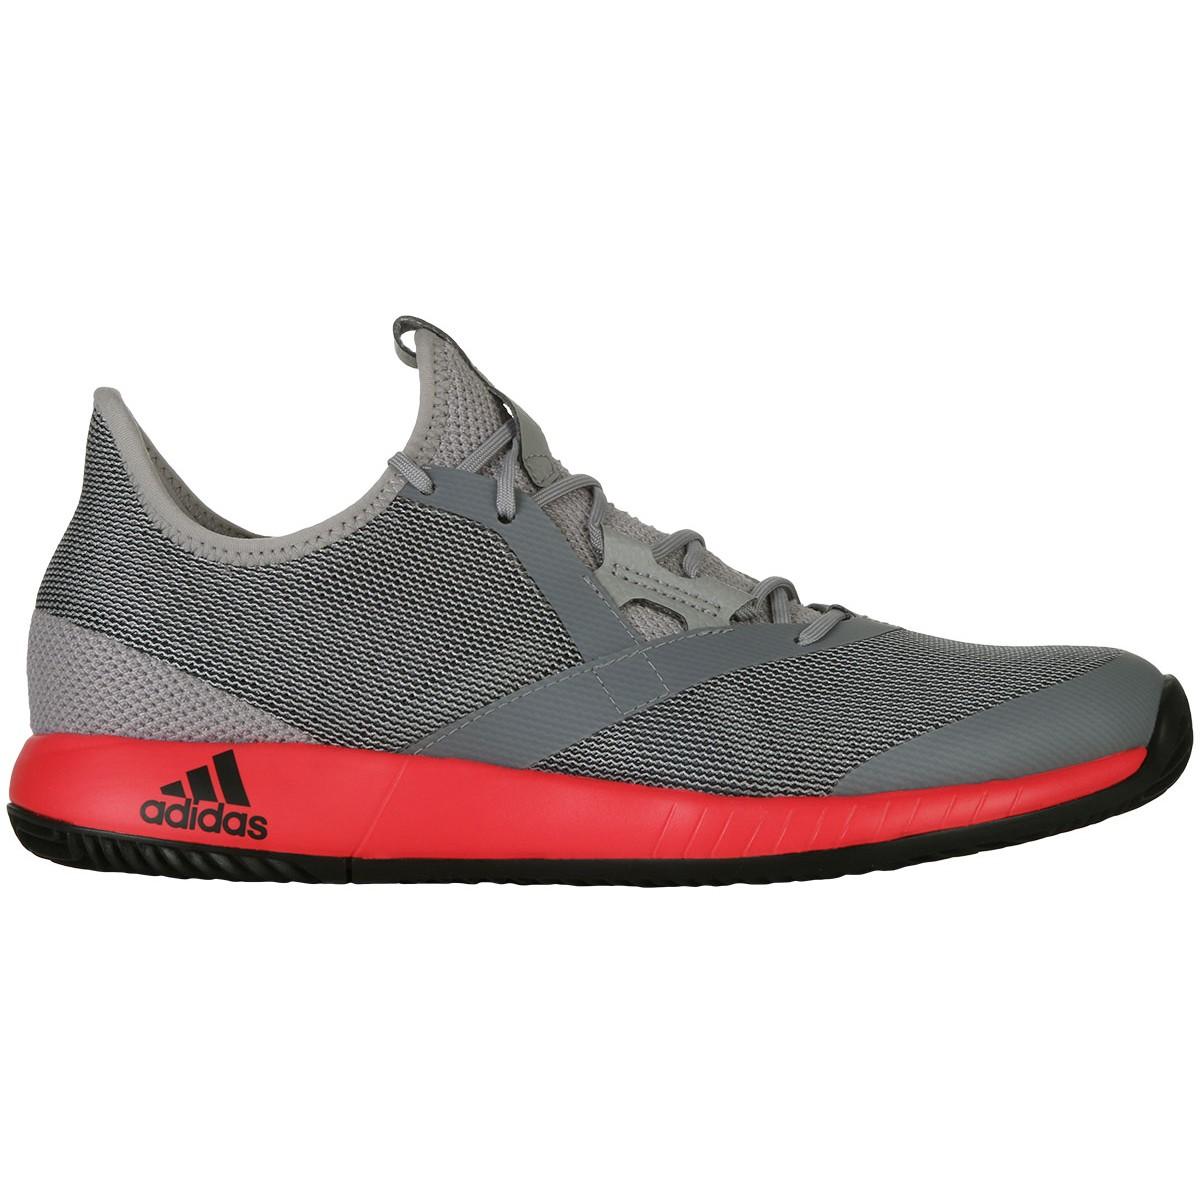 Chaussures adidas adizero defiant bounce terre battue